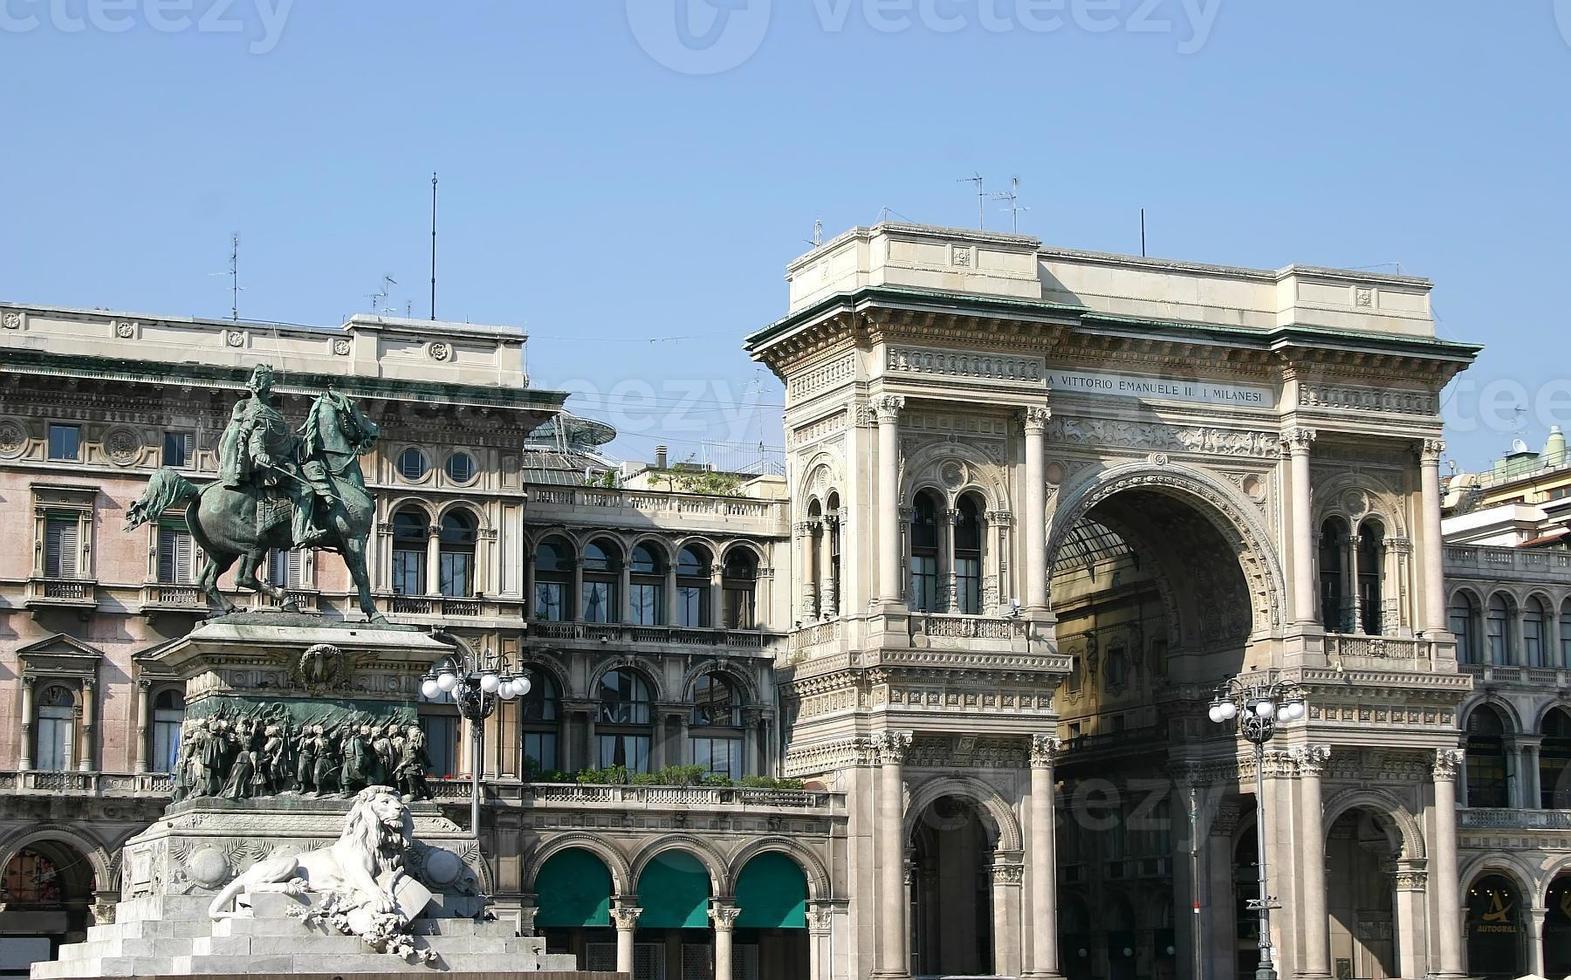 vittorio emanuele ii galerie, milan, italien foto